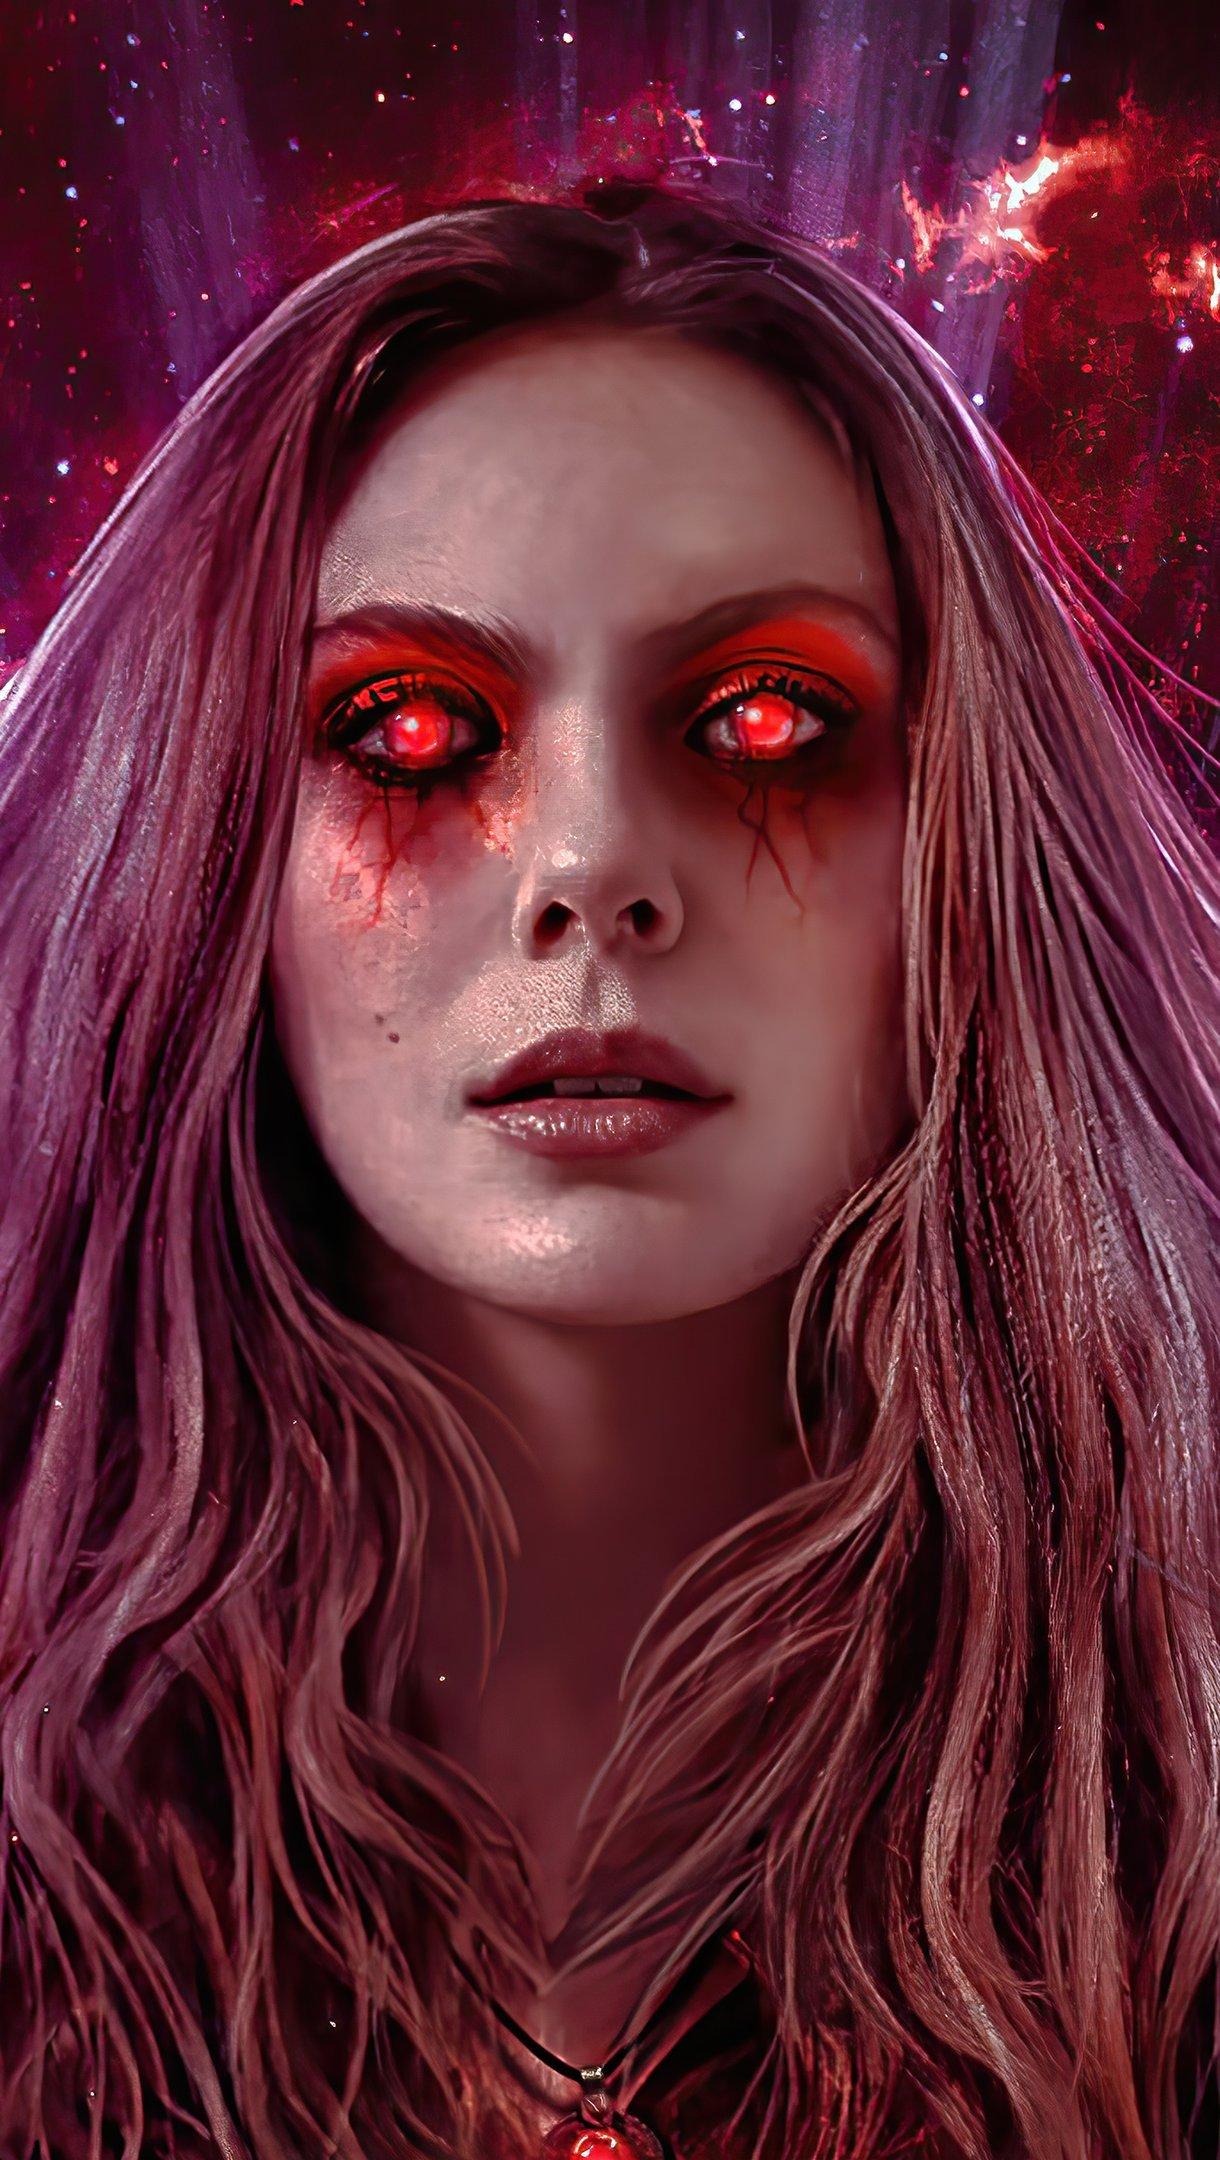 Wallpaper Wanda red eyes Vertical